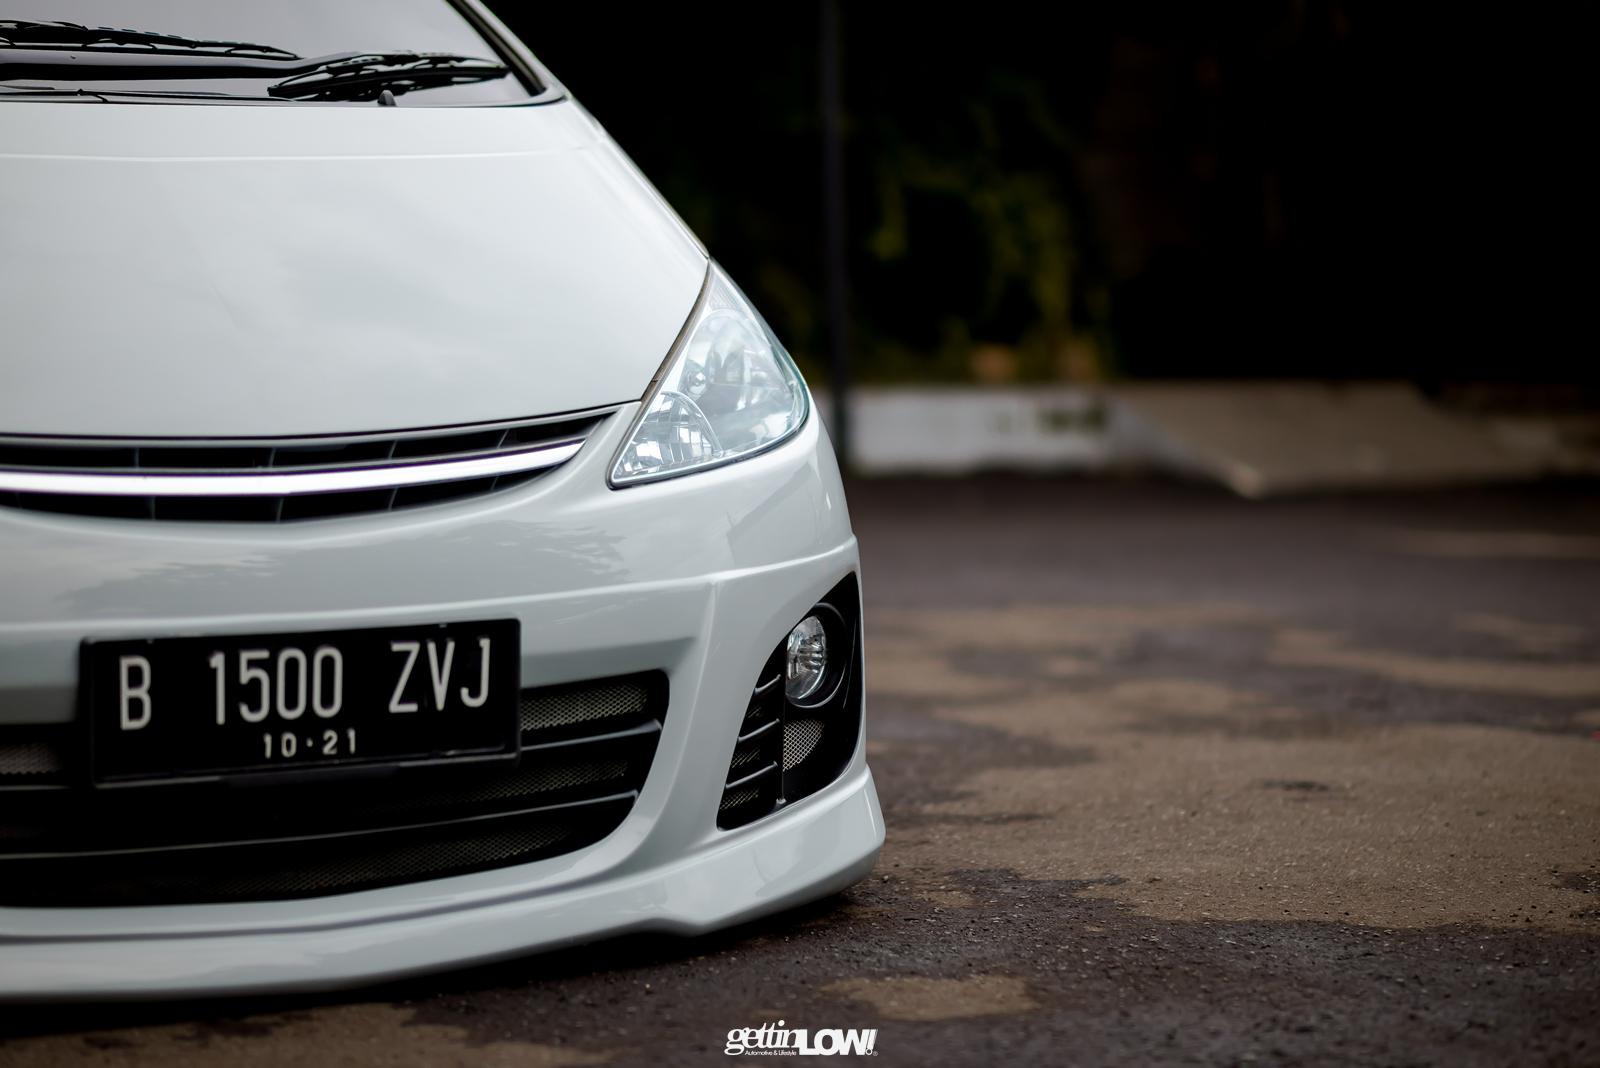 Josint's Toyota Estima